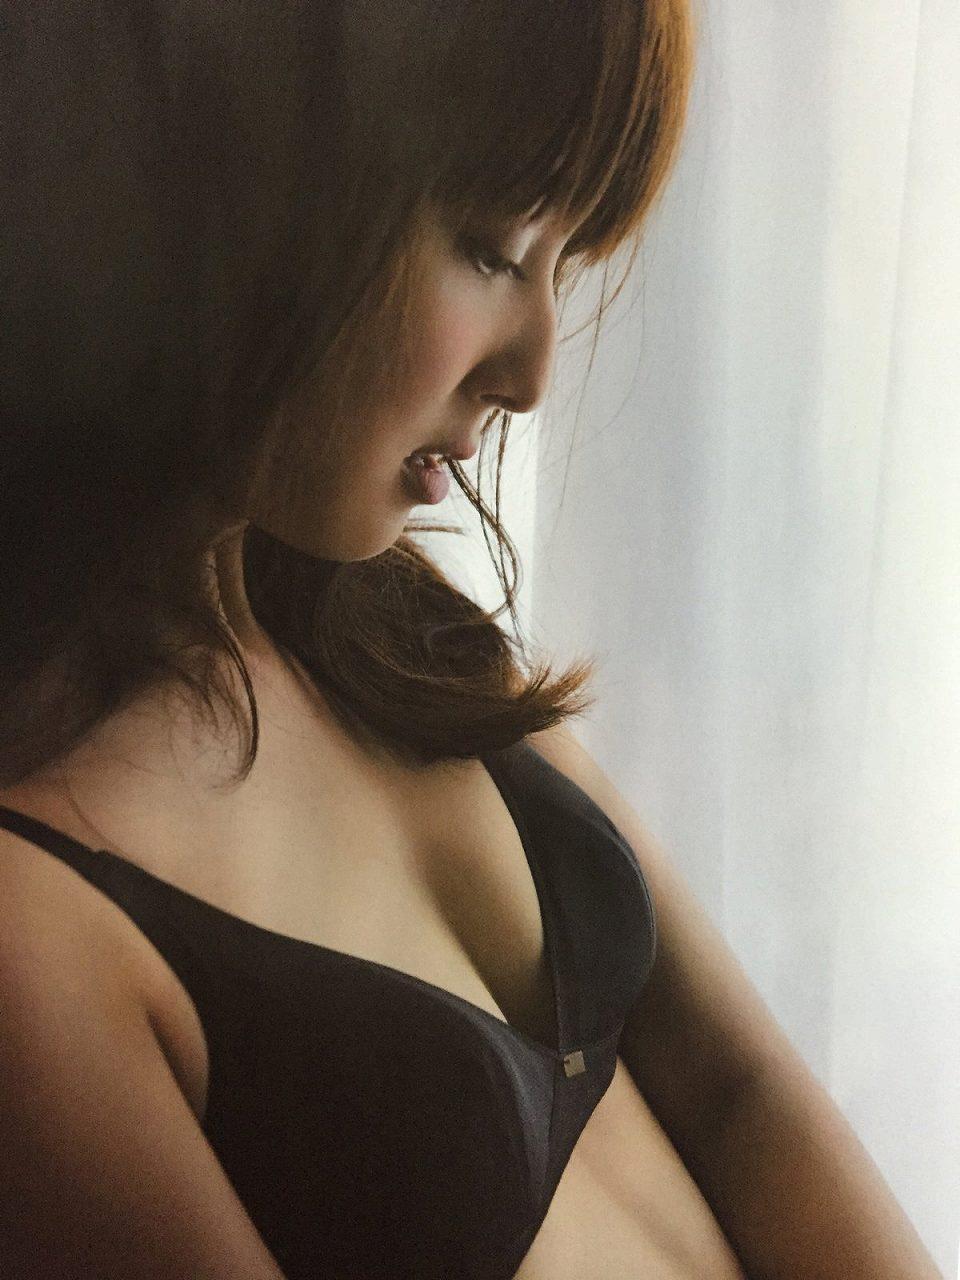 「anan (アンアン) 2015/09/16」佐々木希の水着グラビア